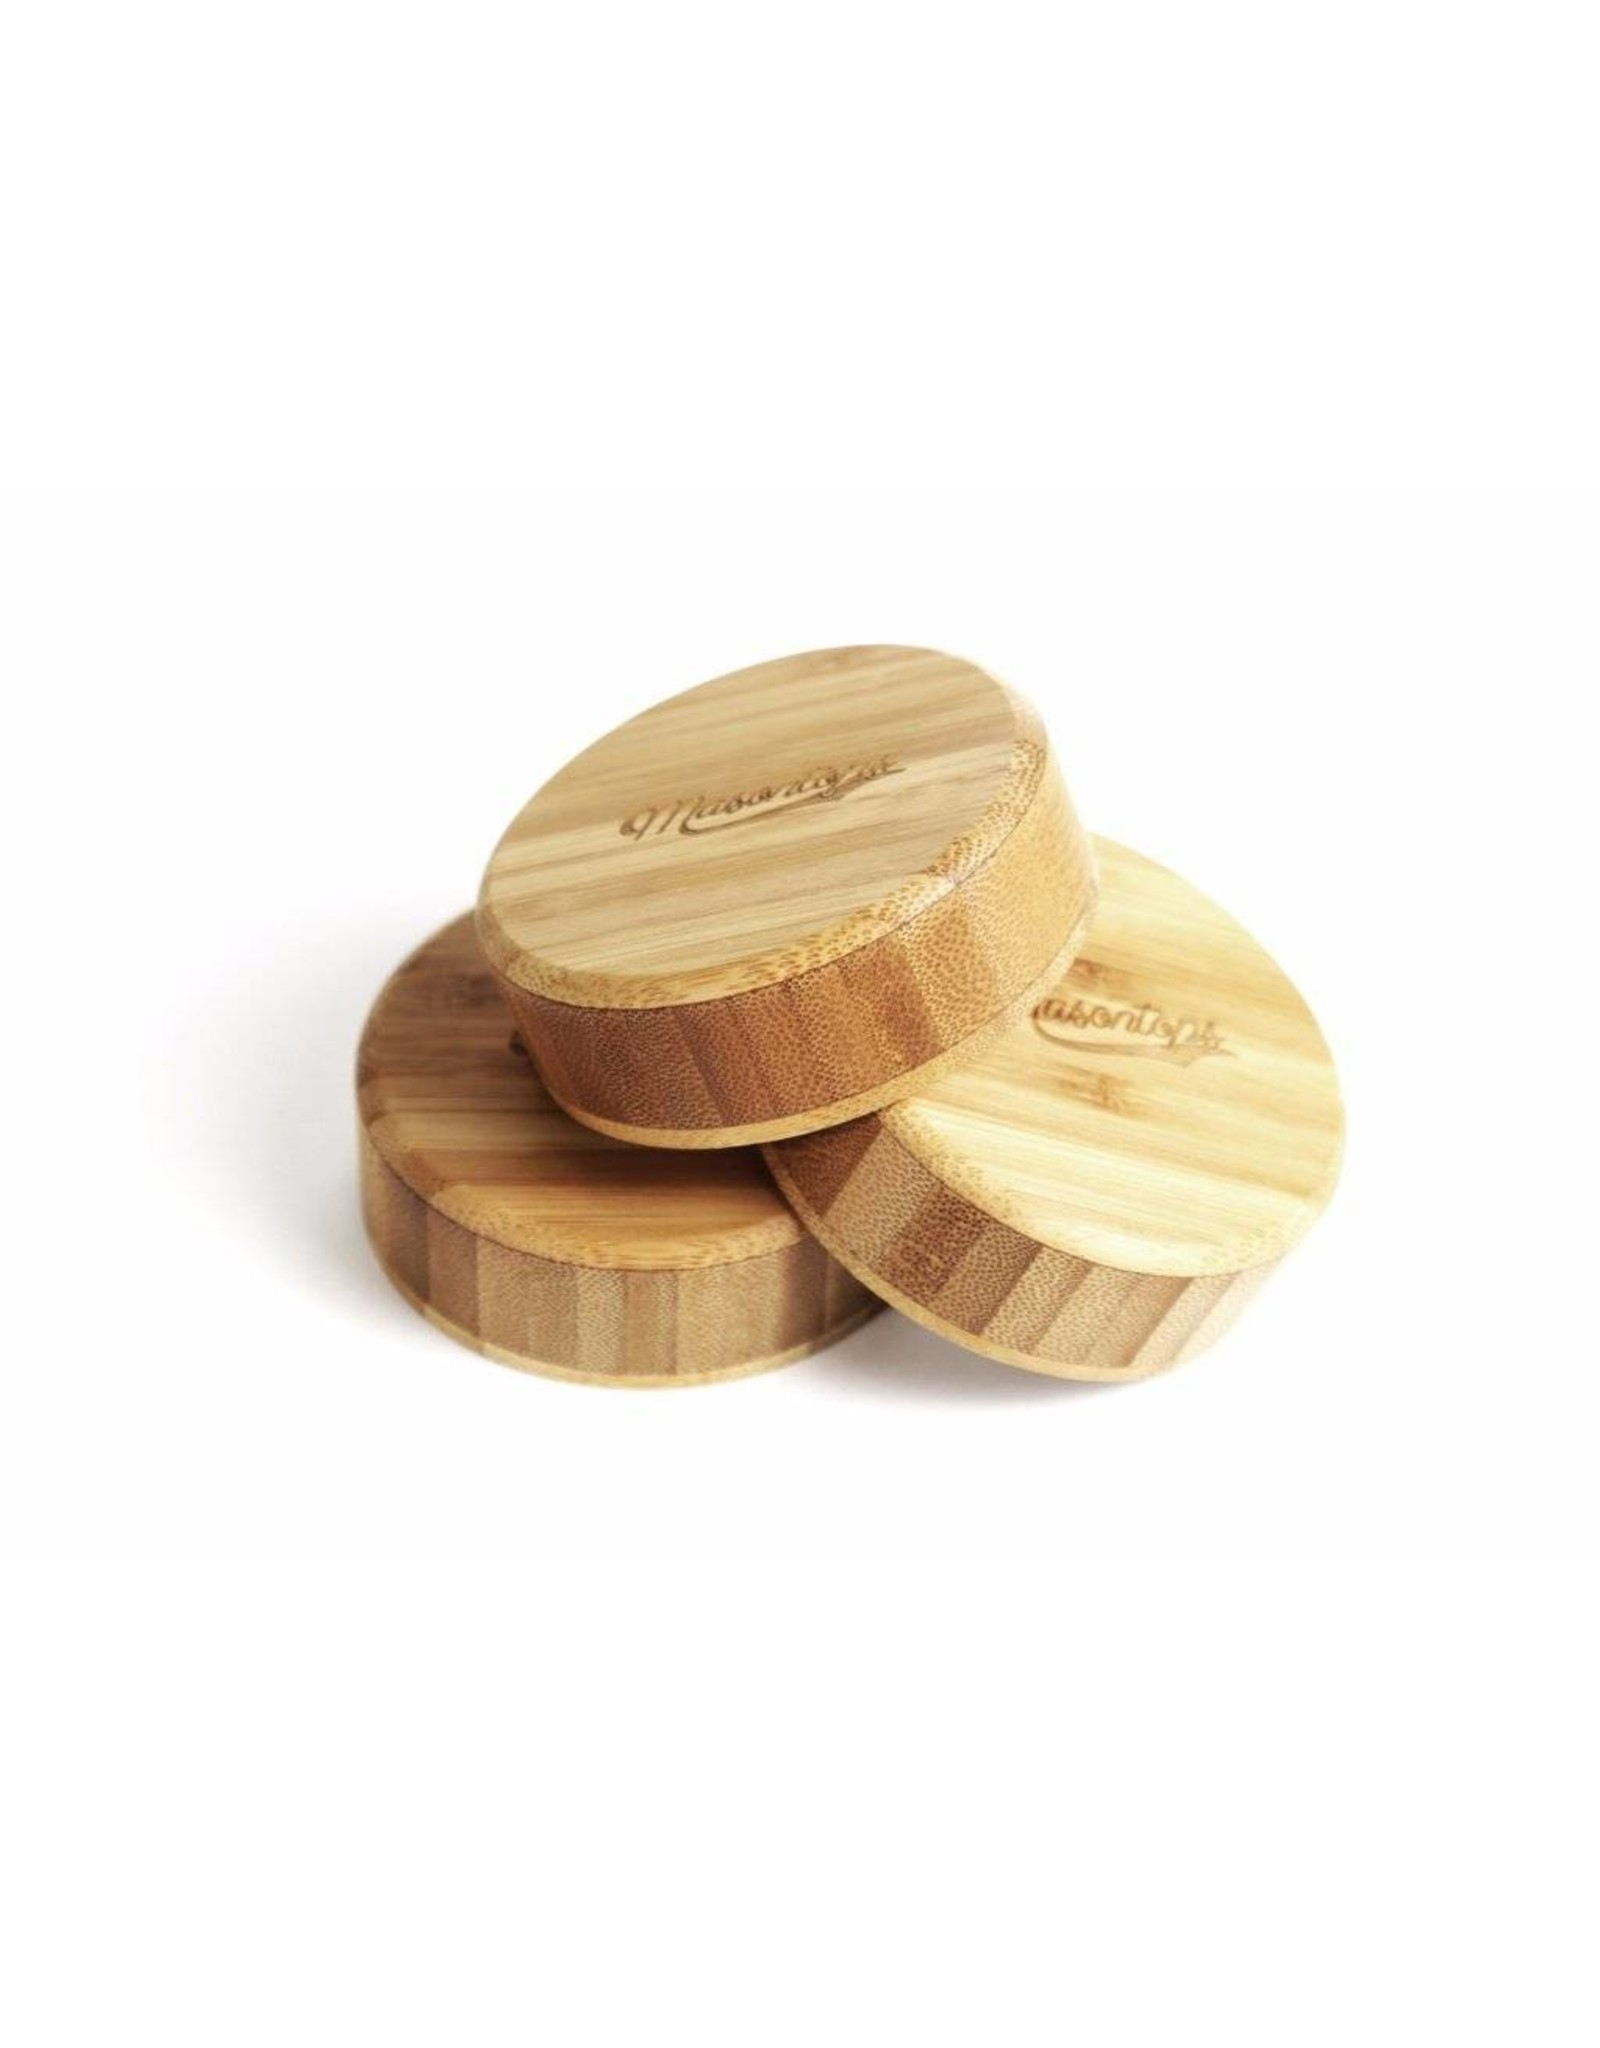 Timber Top Regular Mouth - 3 Pack